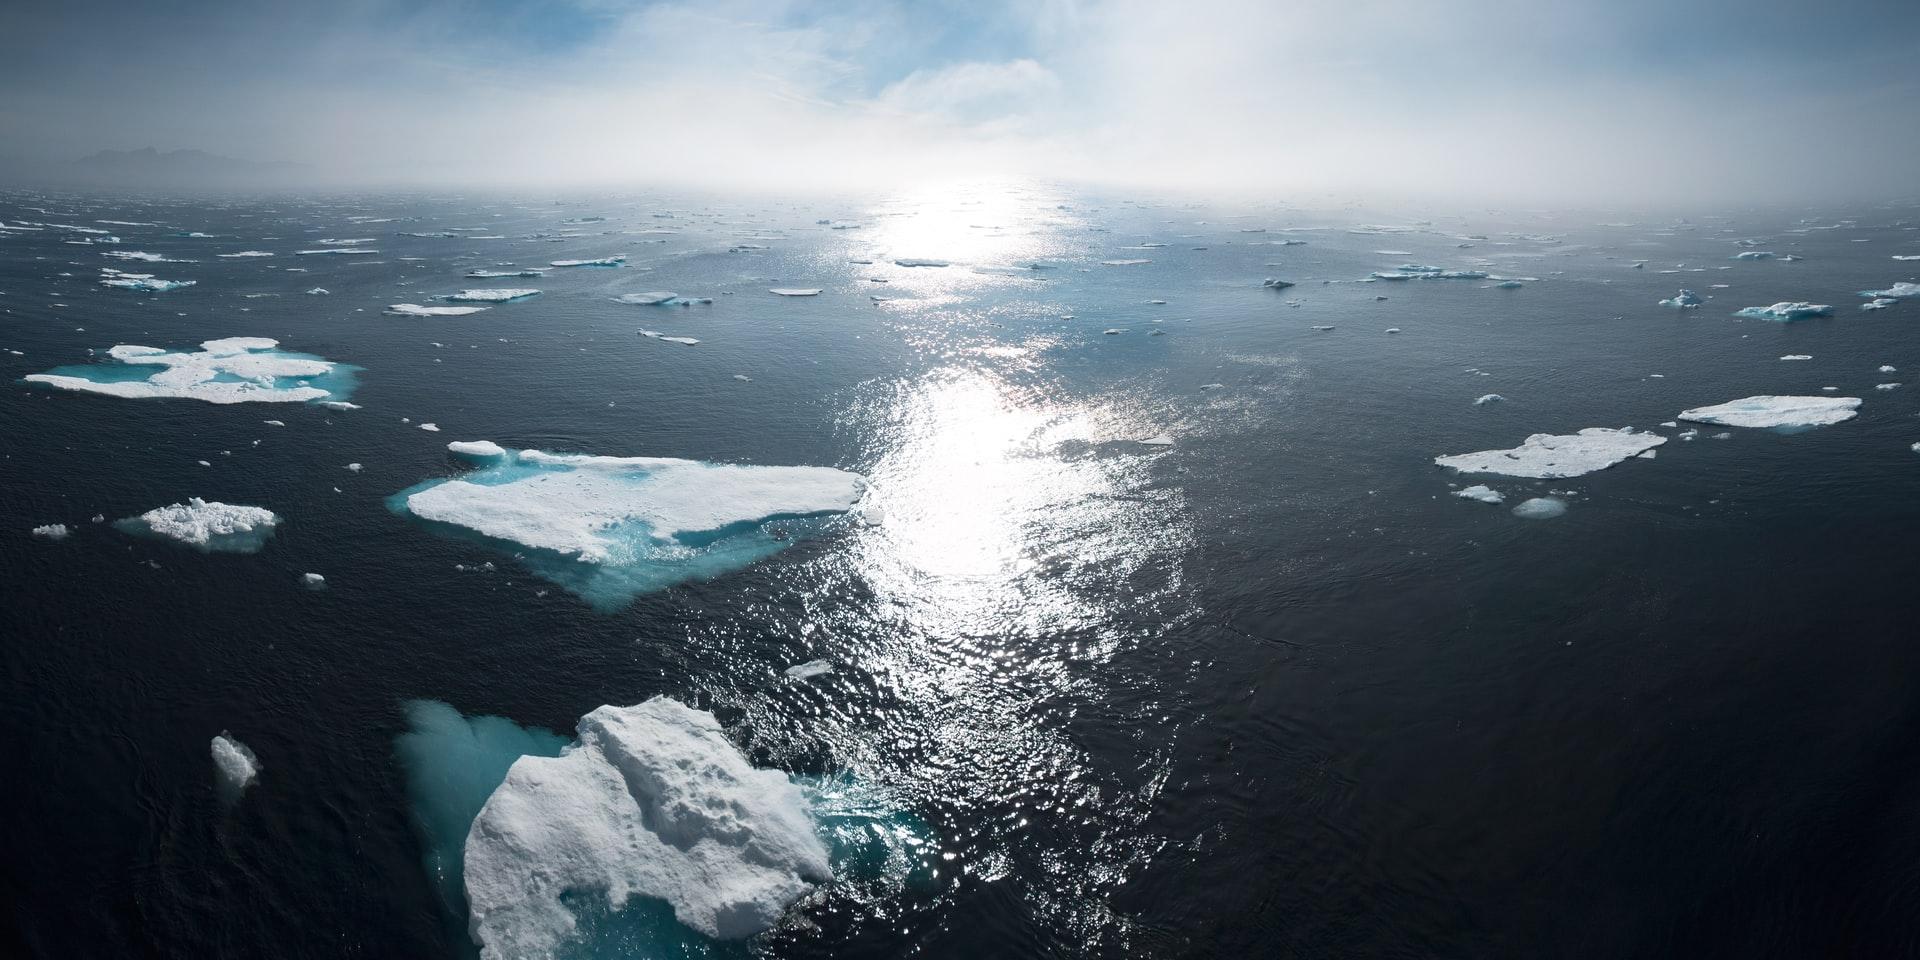 clima- ghiacciai- climate change caldo